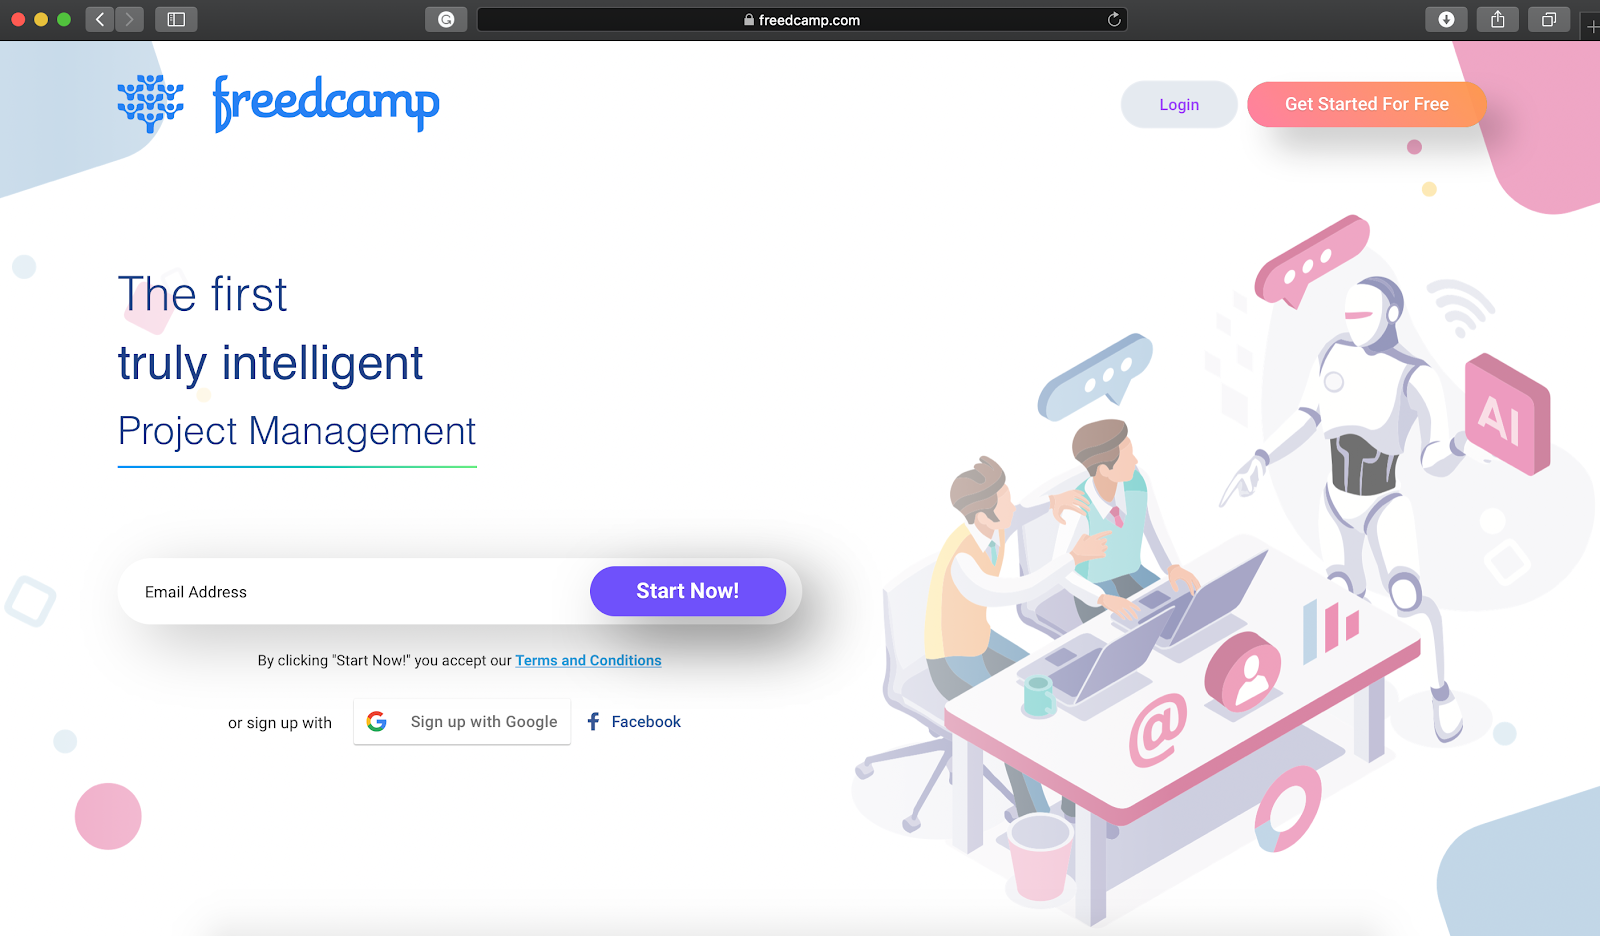 freedcamp app